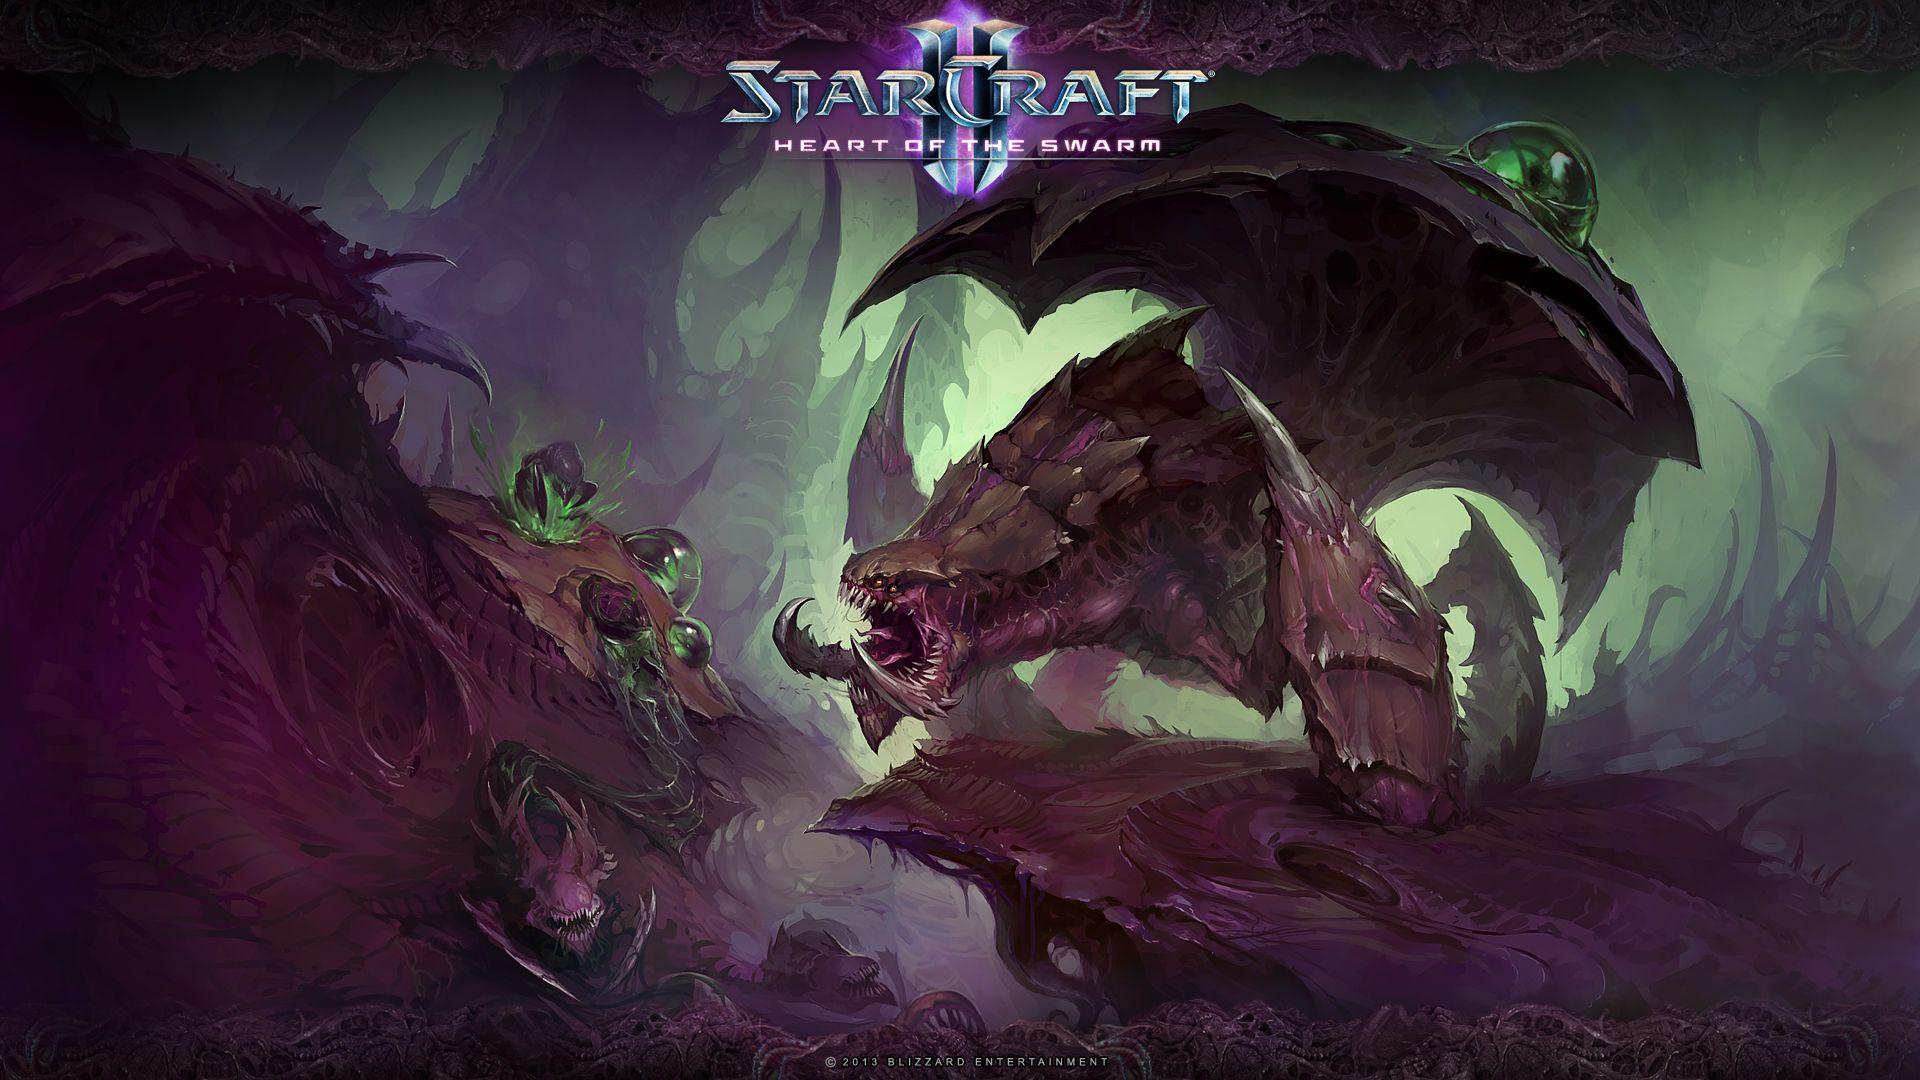 Starcraft 2 Heart of the Swarm wallpaper 18